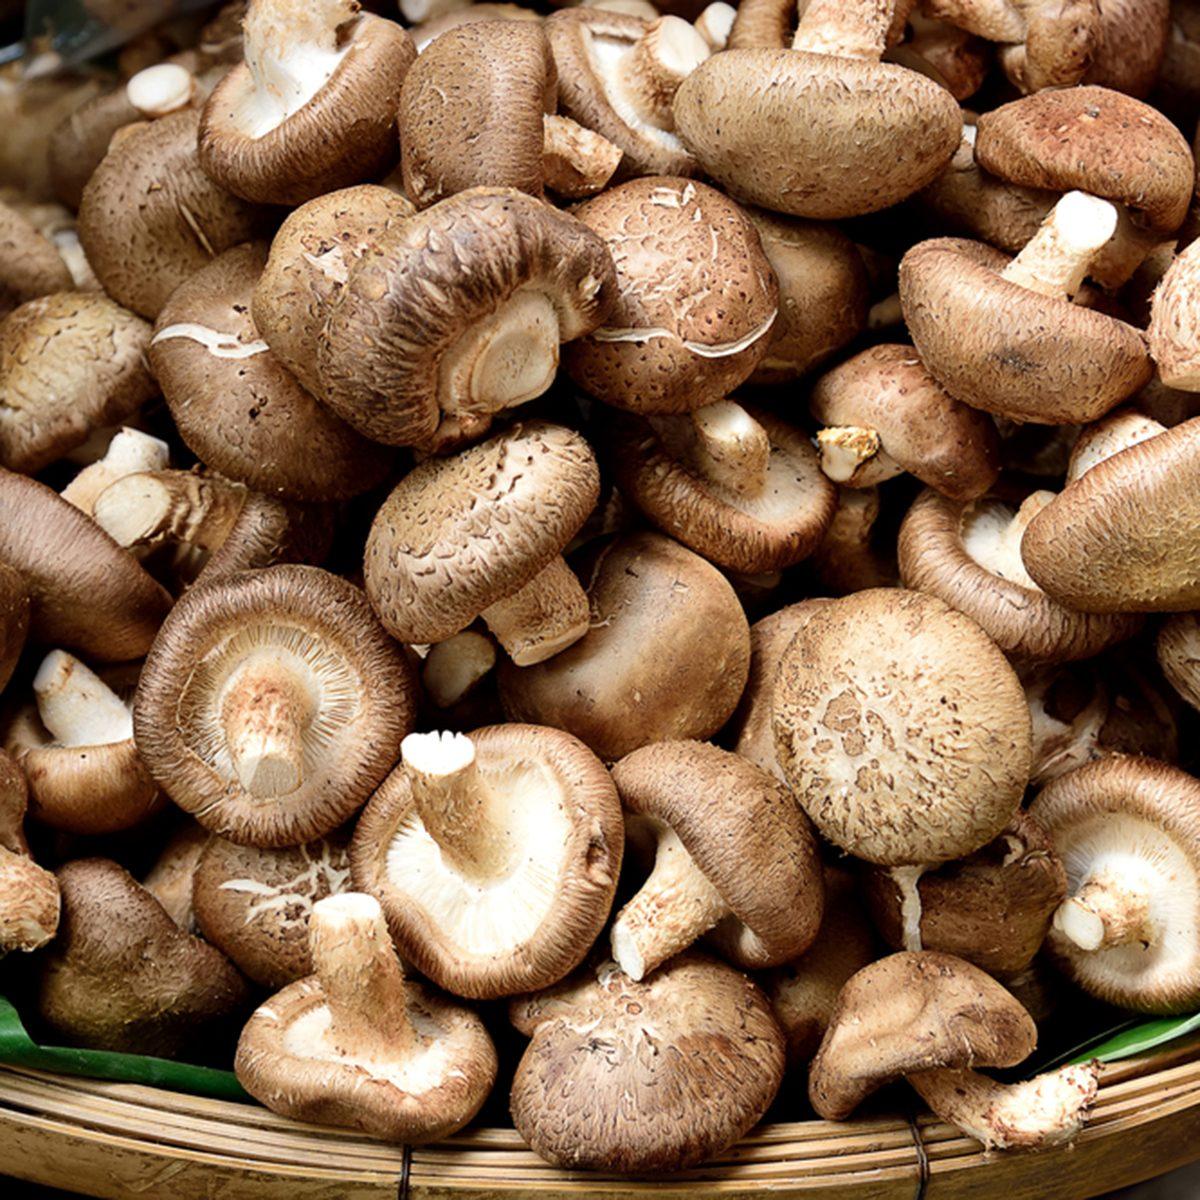 Raw and dried shitake mushroom that has medicinal nutritional health benefits